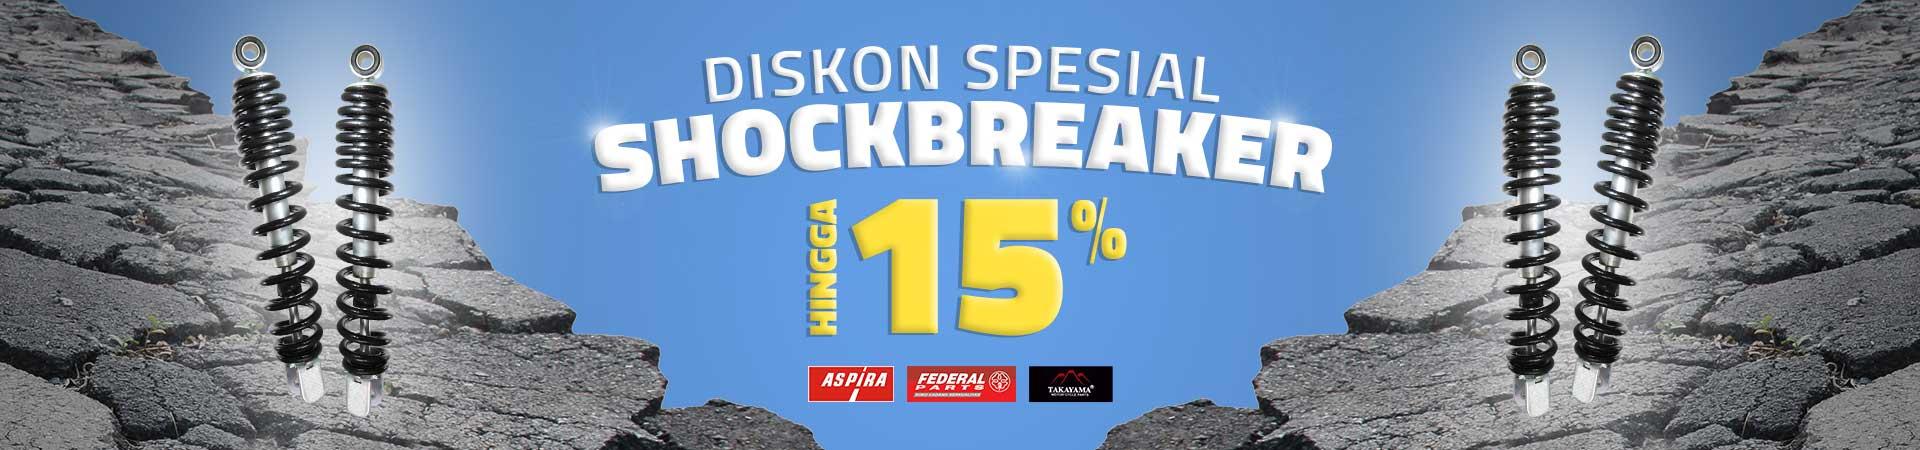 Shockbreaker Deals! Diskon Hingga 20 Persen